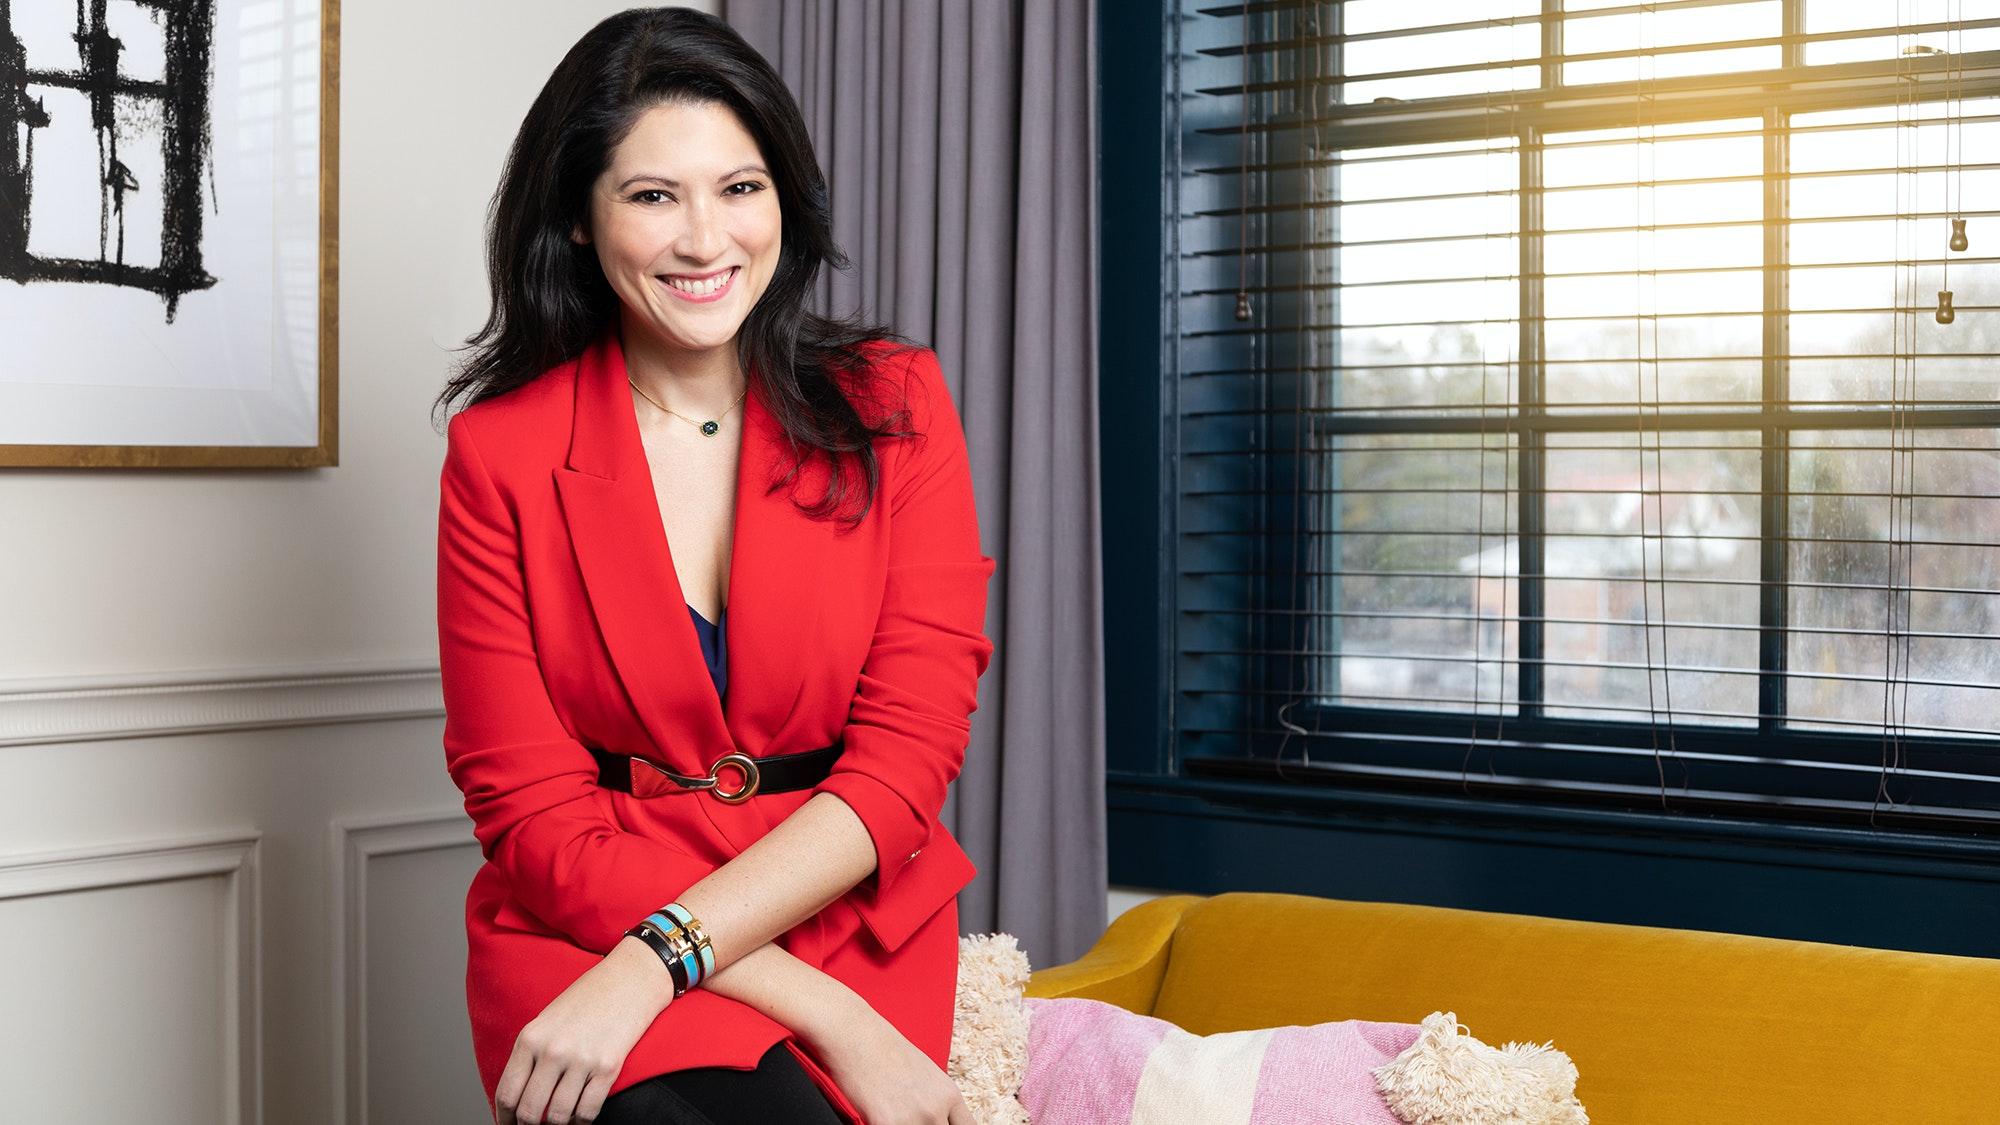 Atlantan Magazine Editor-in-Chief Lauren Finney Shares Her Favorite Luxe Beauty Locations